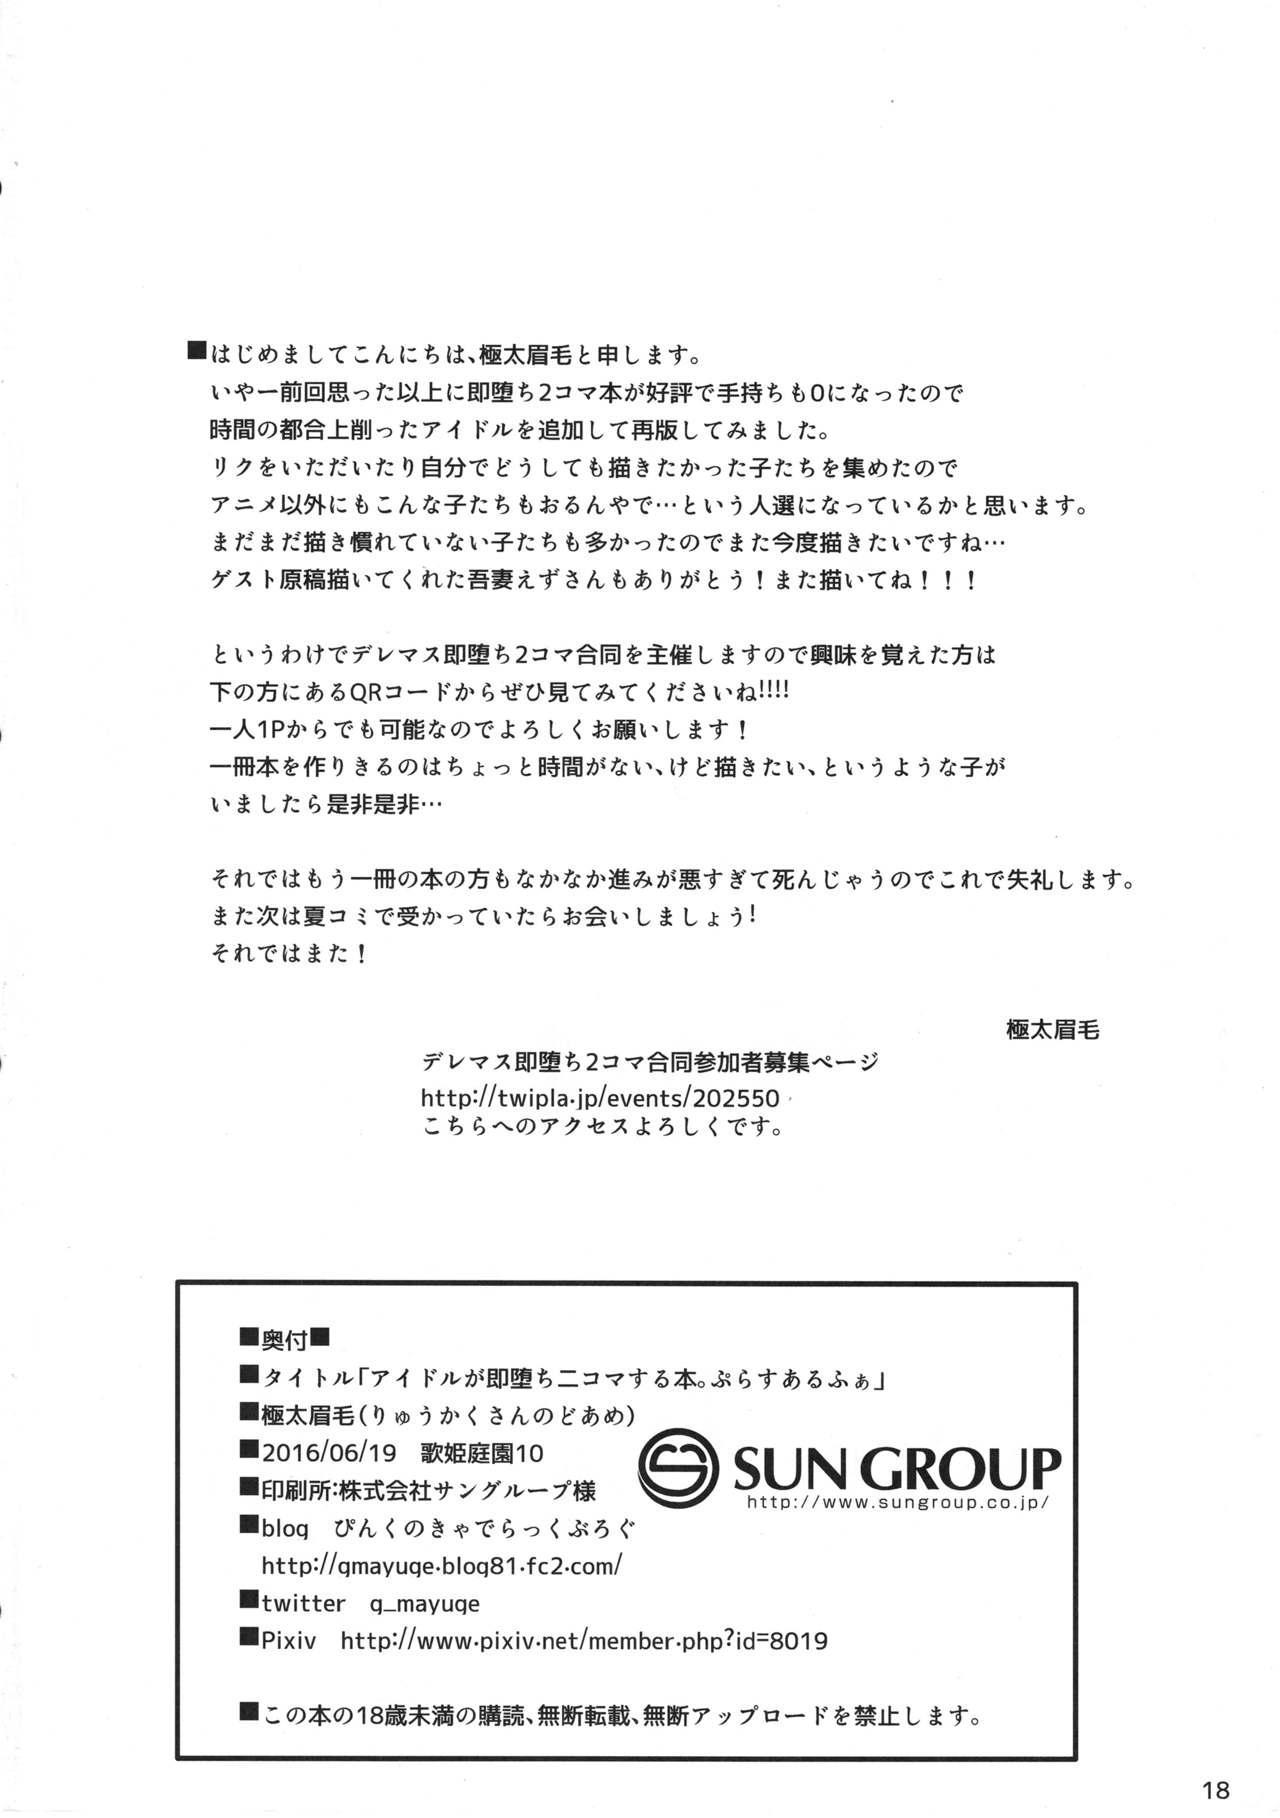 Idol ga Sokuochi Nikoma Suru Hon. Plus Alpha 20